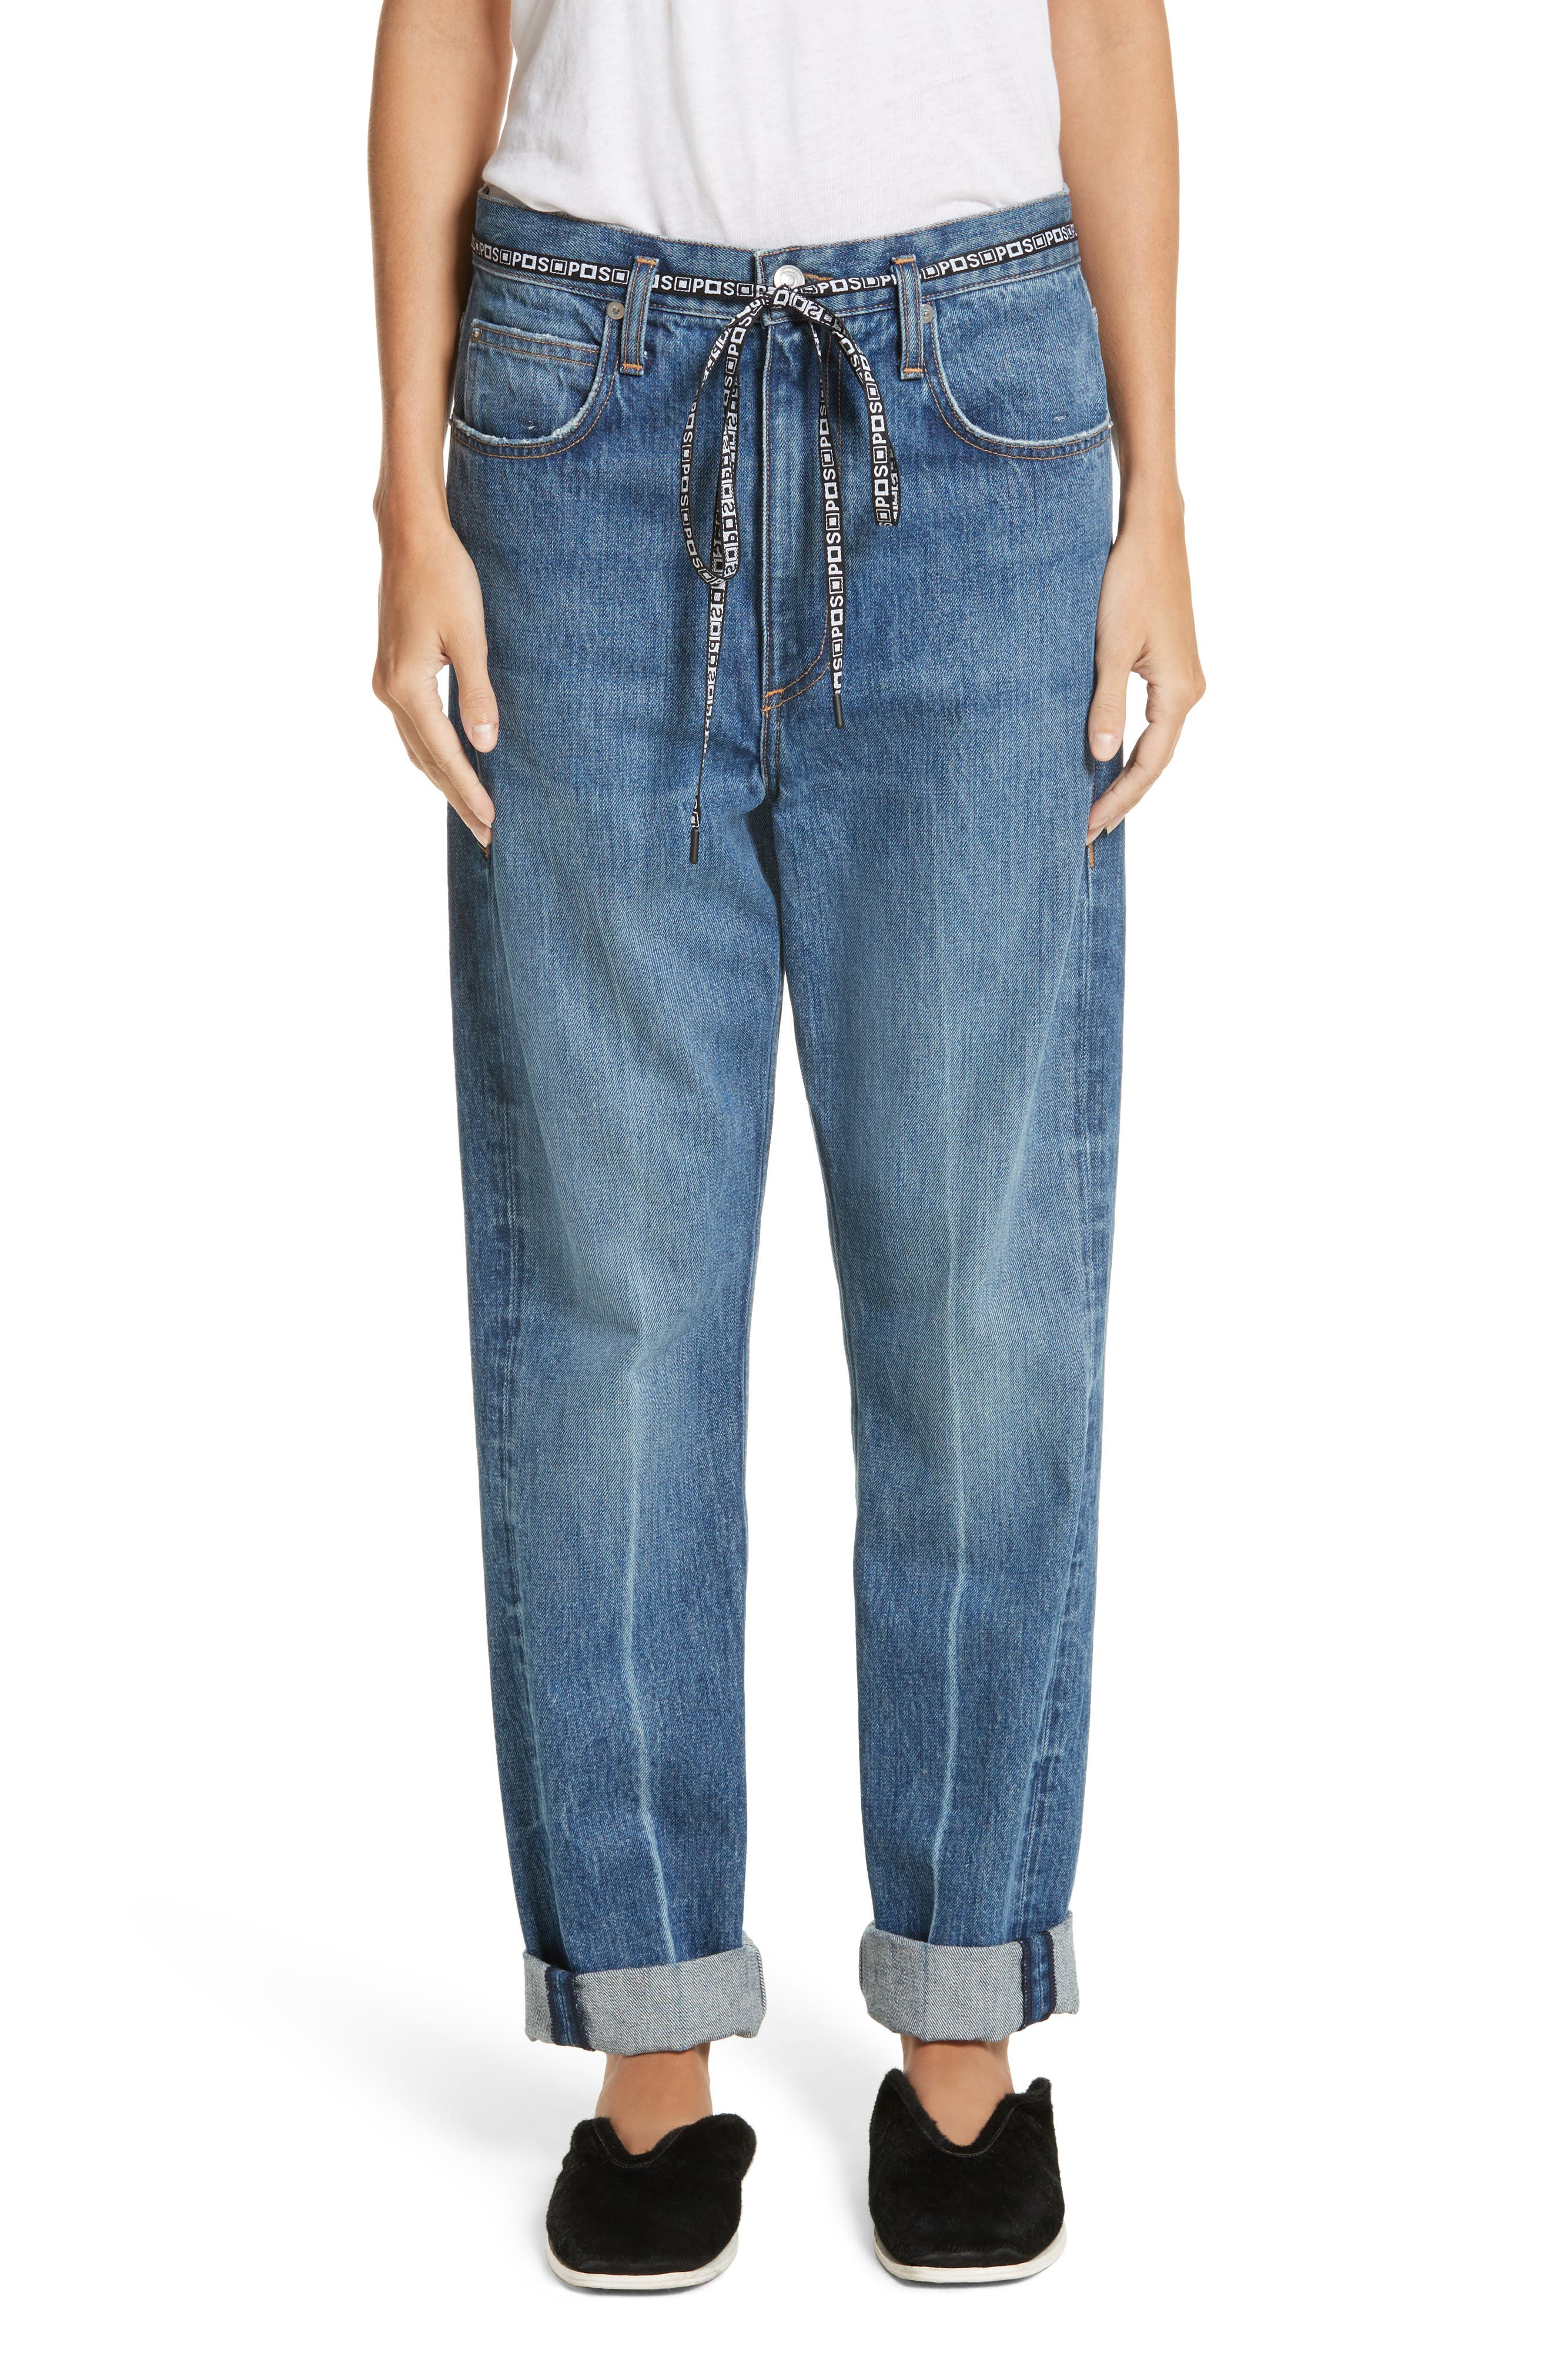 PSWL Cuffed Straight Leg Jeans,                         Main,                         color, Medium Blue